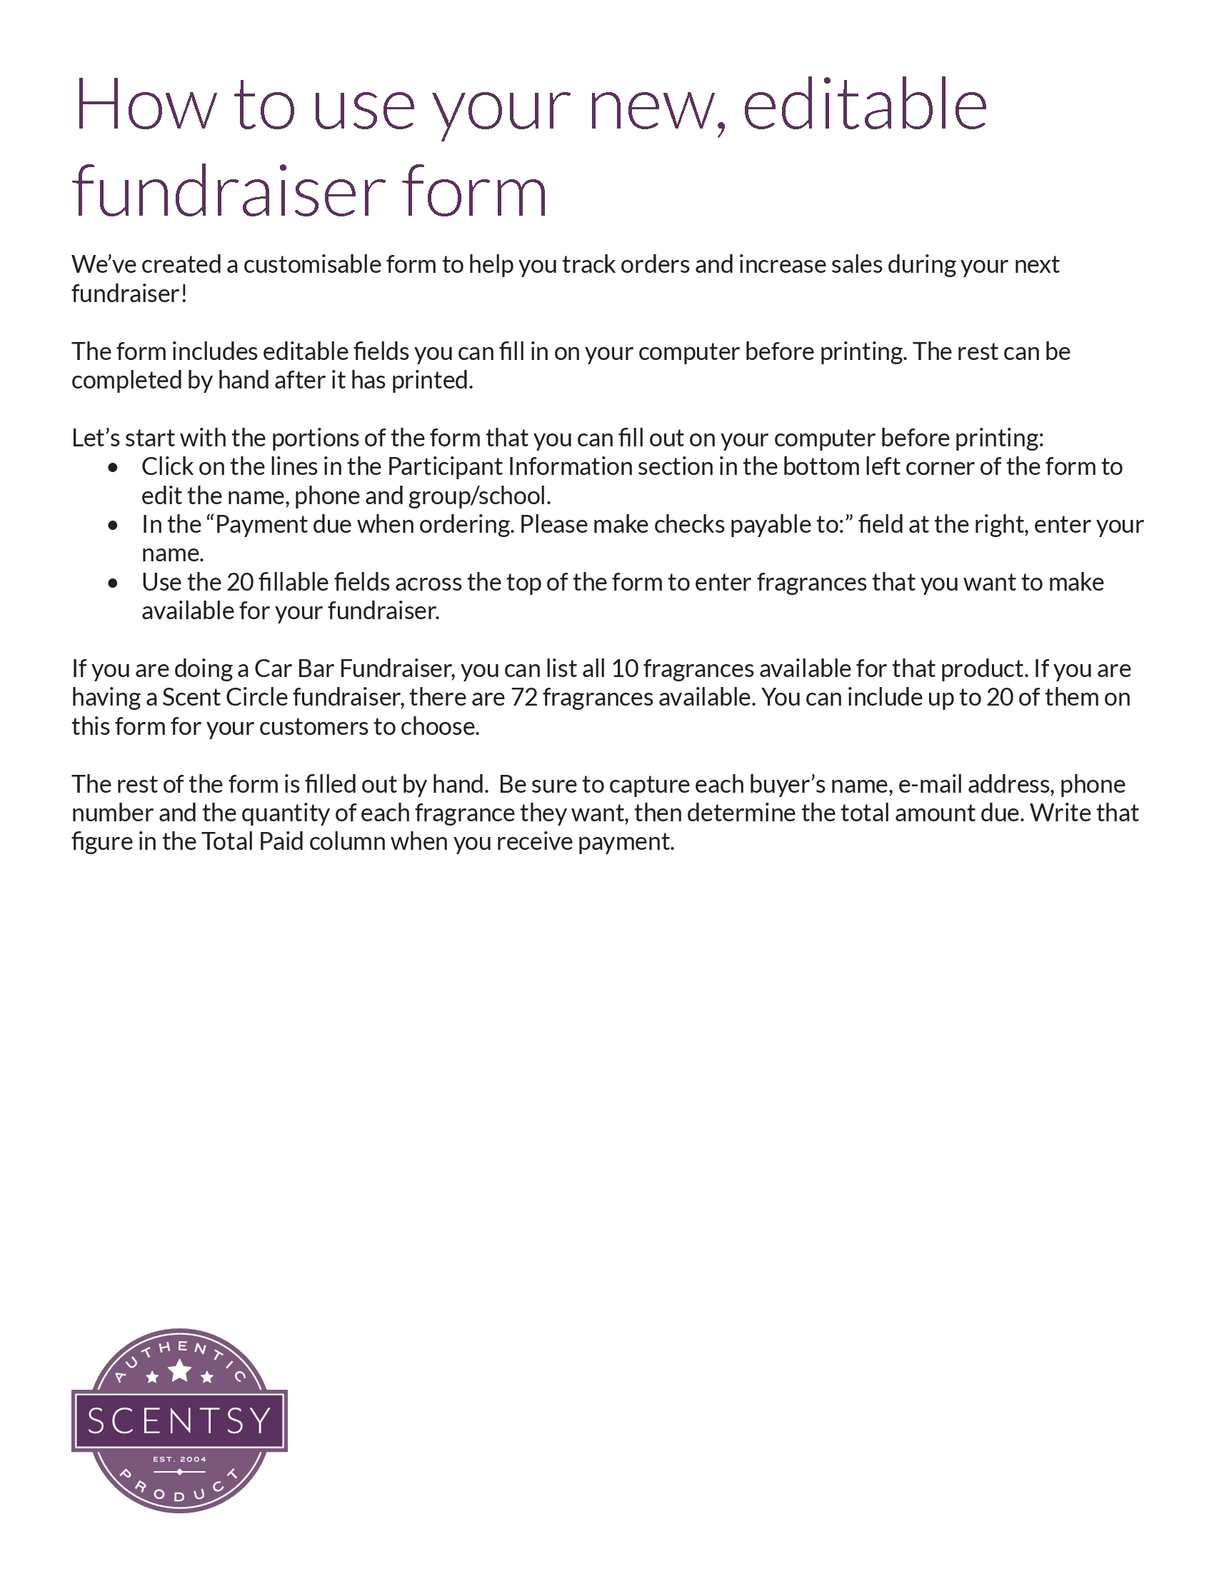 Calameo Fundraising Spreadsheet Instructions